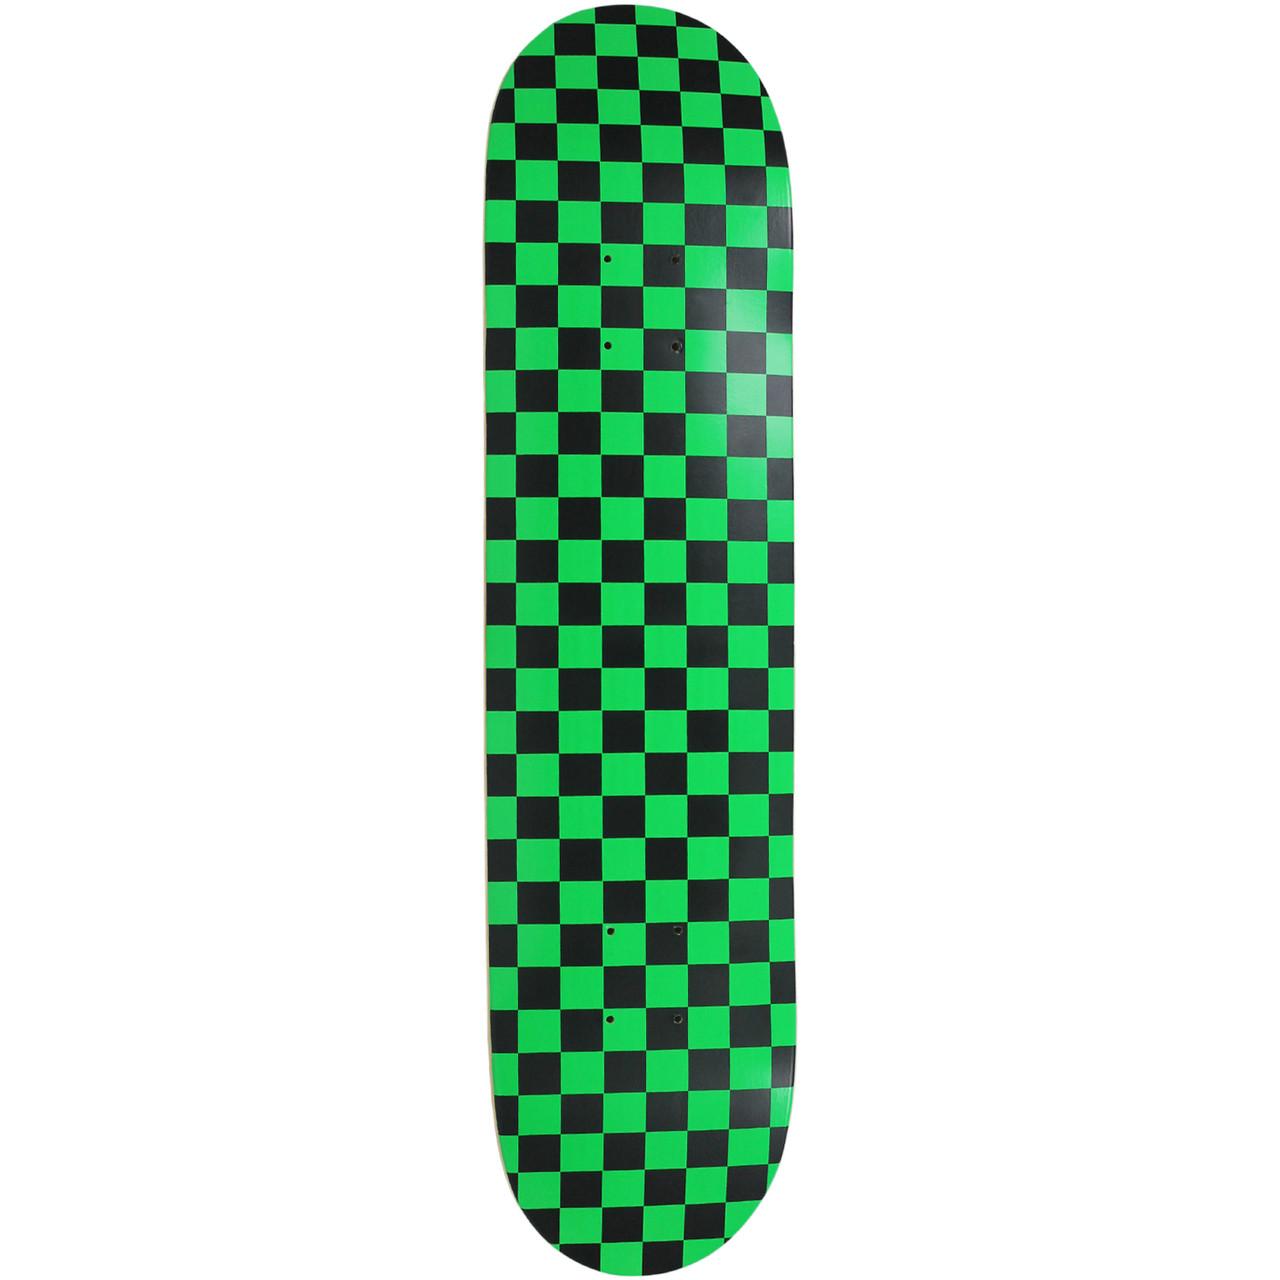 MOOSE Blank SKATEBOARD DECK 8.25 BLACK Skateboards